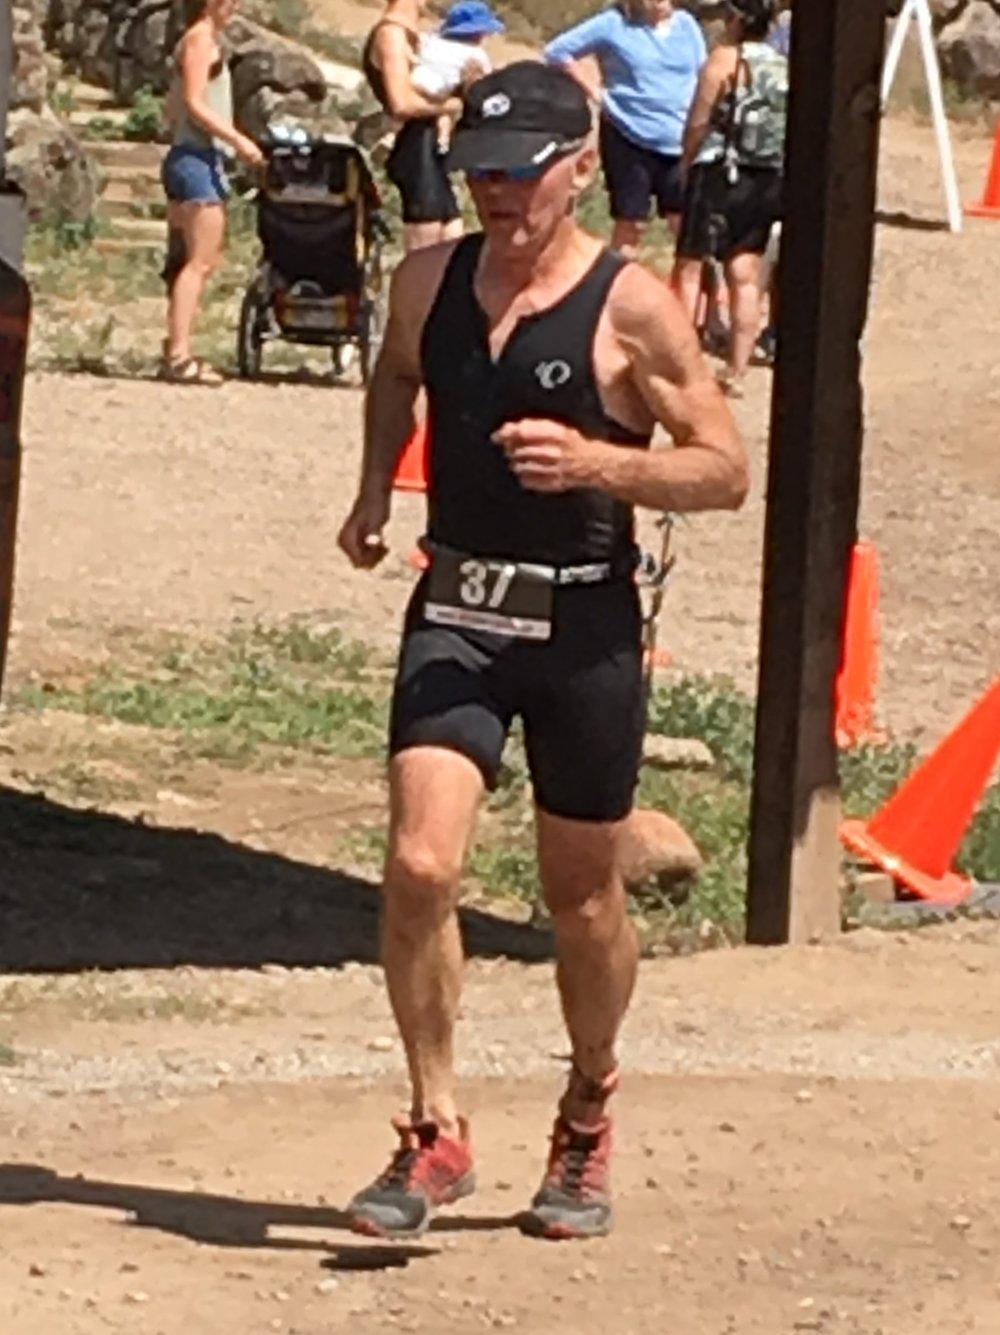 Dr. Kurt finishing the Aspen Valley Xterra race